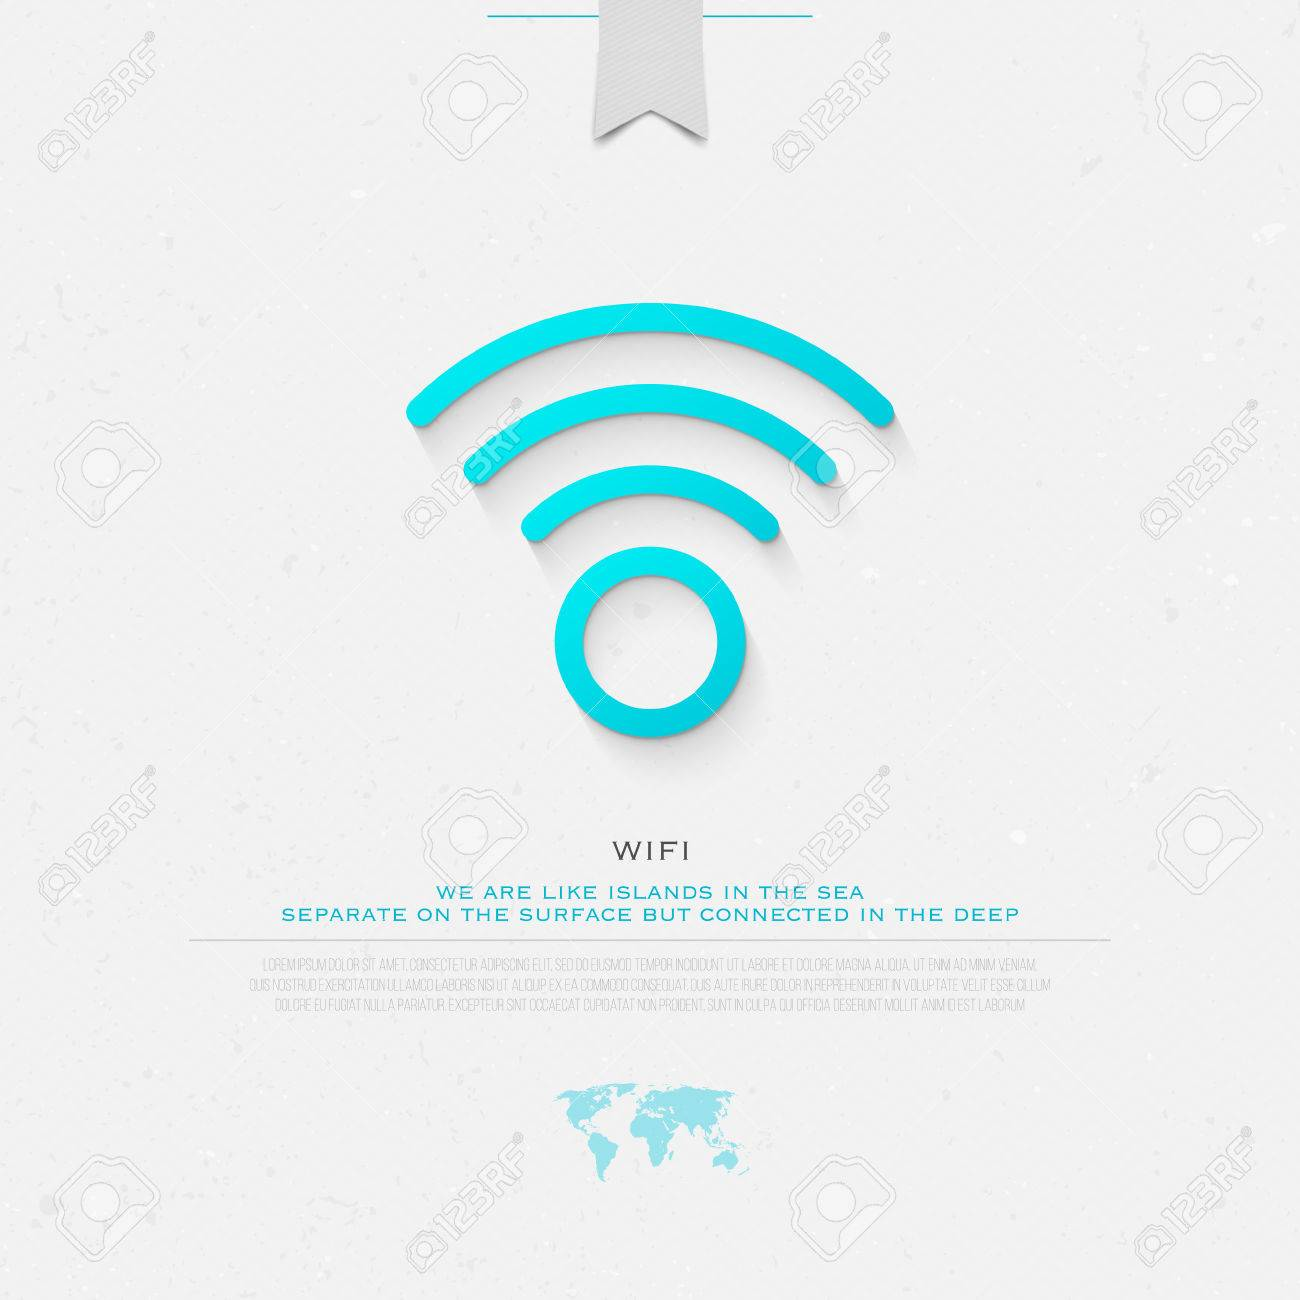 New thin line style wireless icon isolated radio wave symbol new thin line style wireless icon isolated radio wave symbol free internet connection zone buycottarizona Images